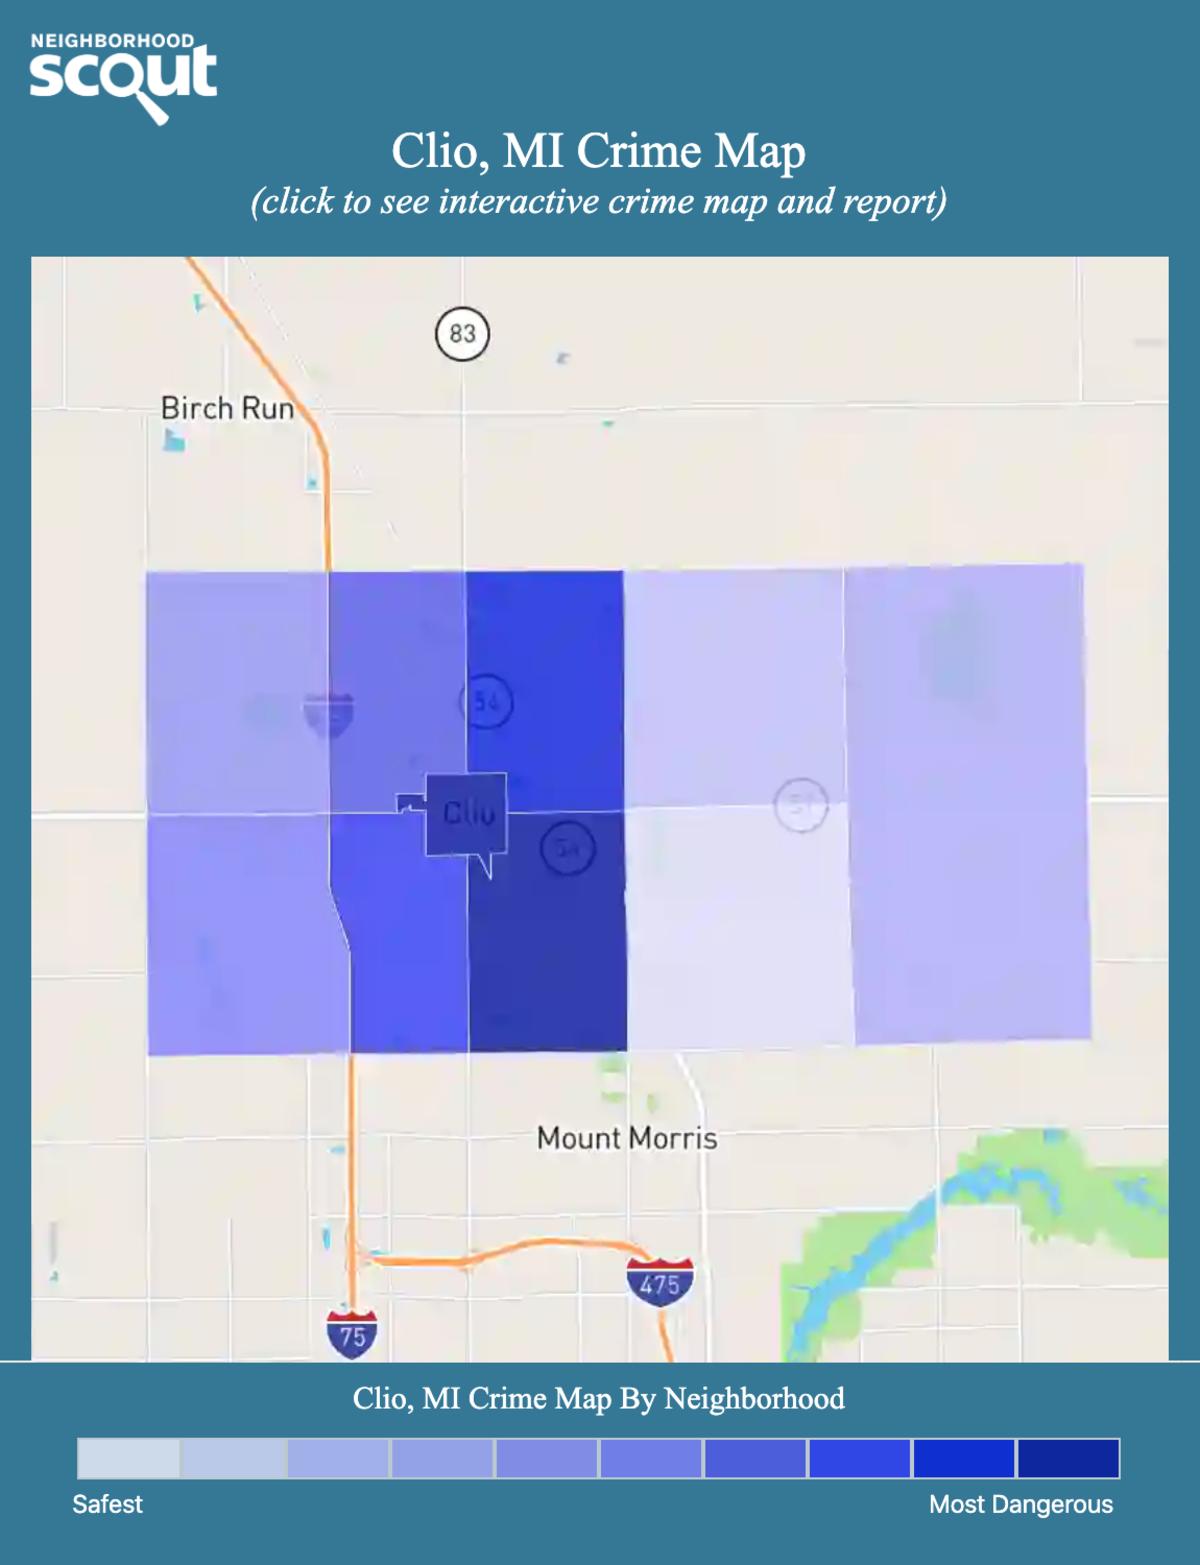 Clio, Michigan crime map